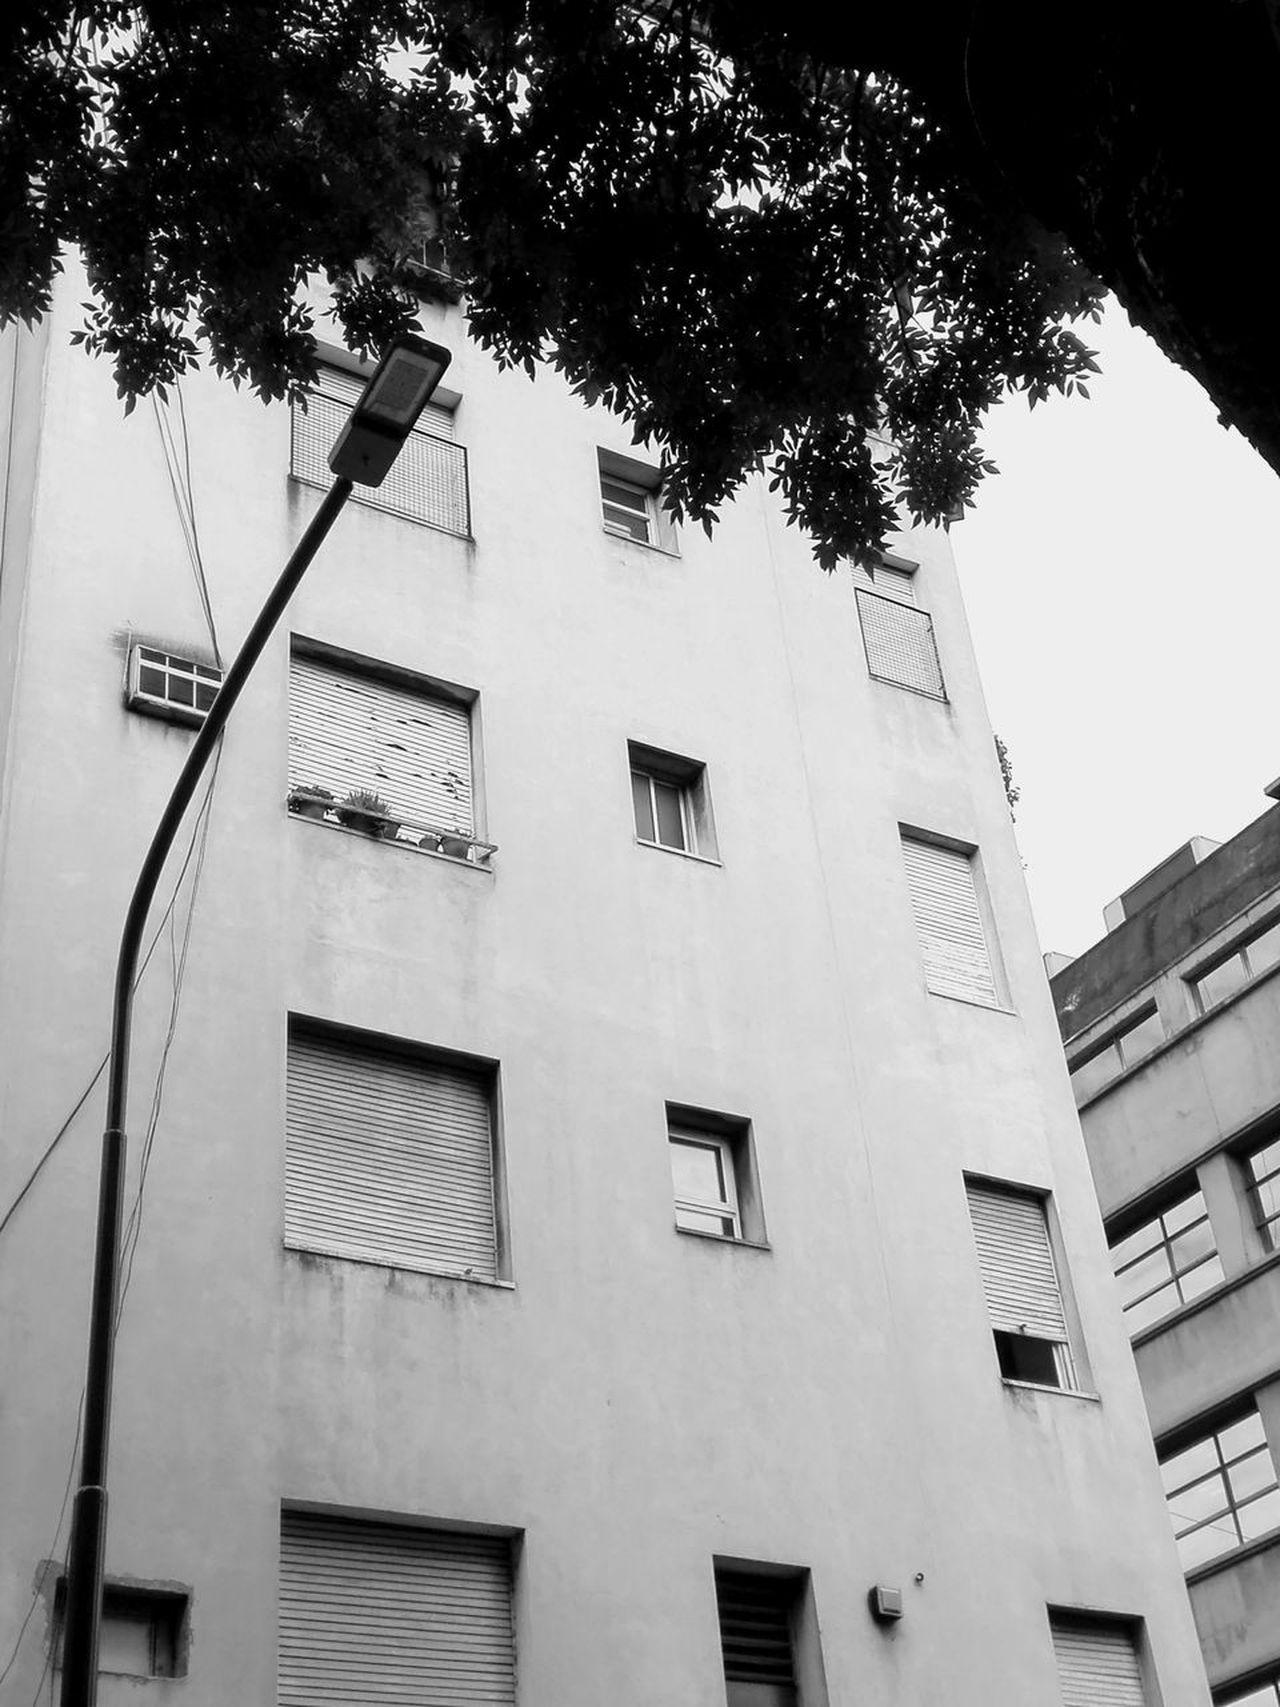 BW_photography City Cityexplorer Urban Exploration Building Exterior Architecture Built Structure No People Sky Day Outdoors